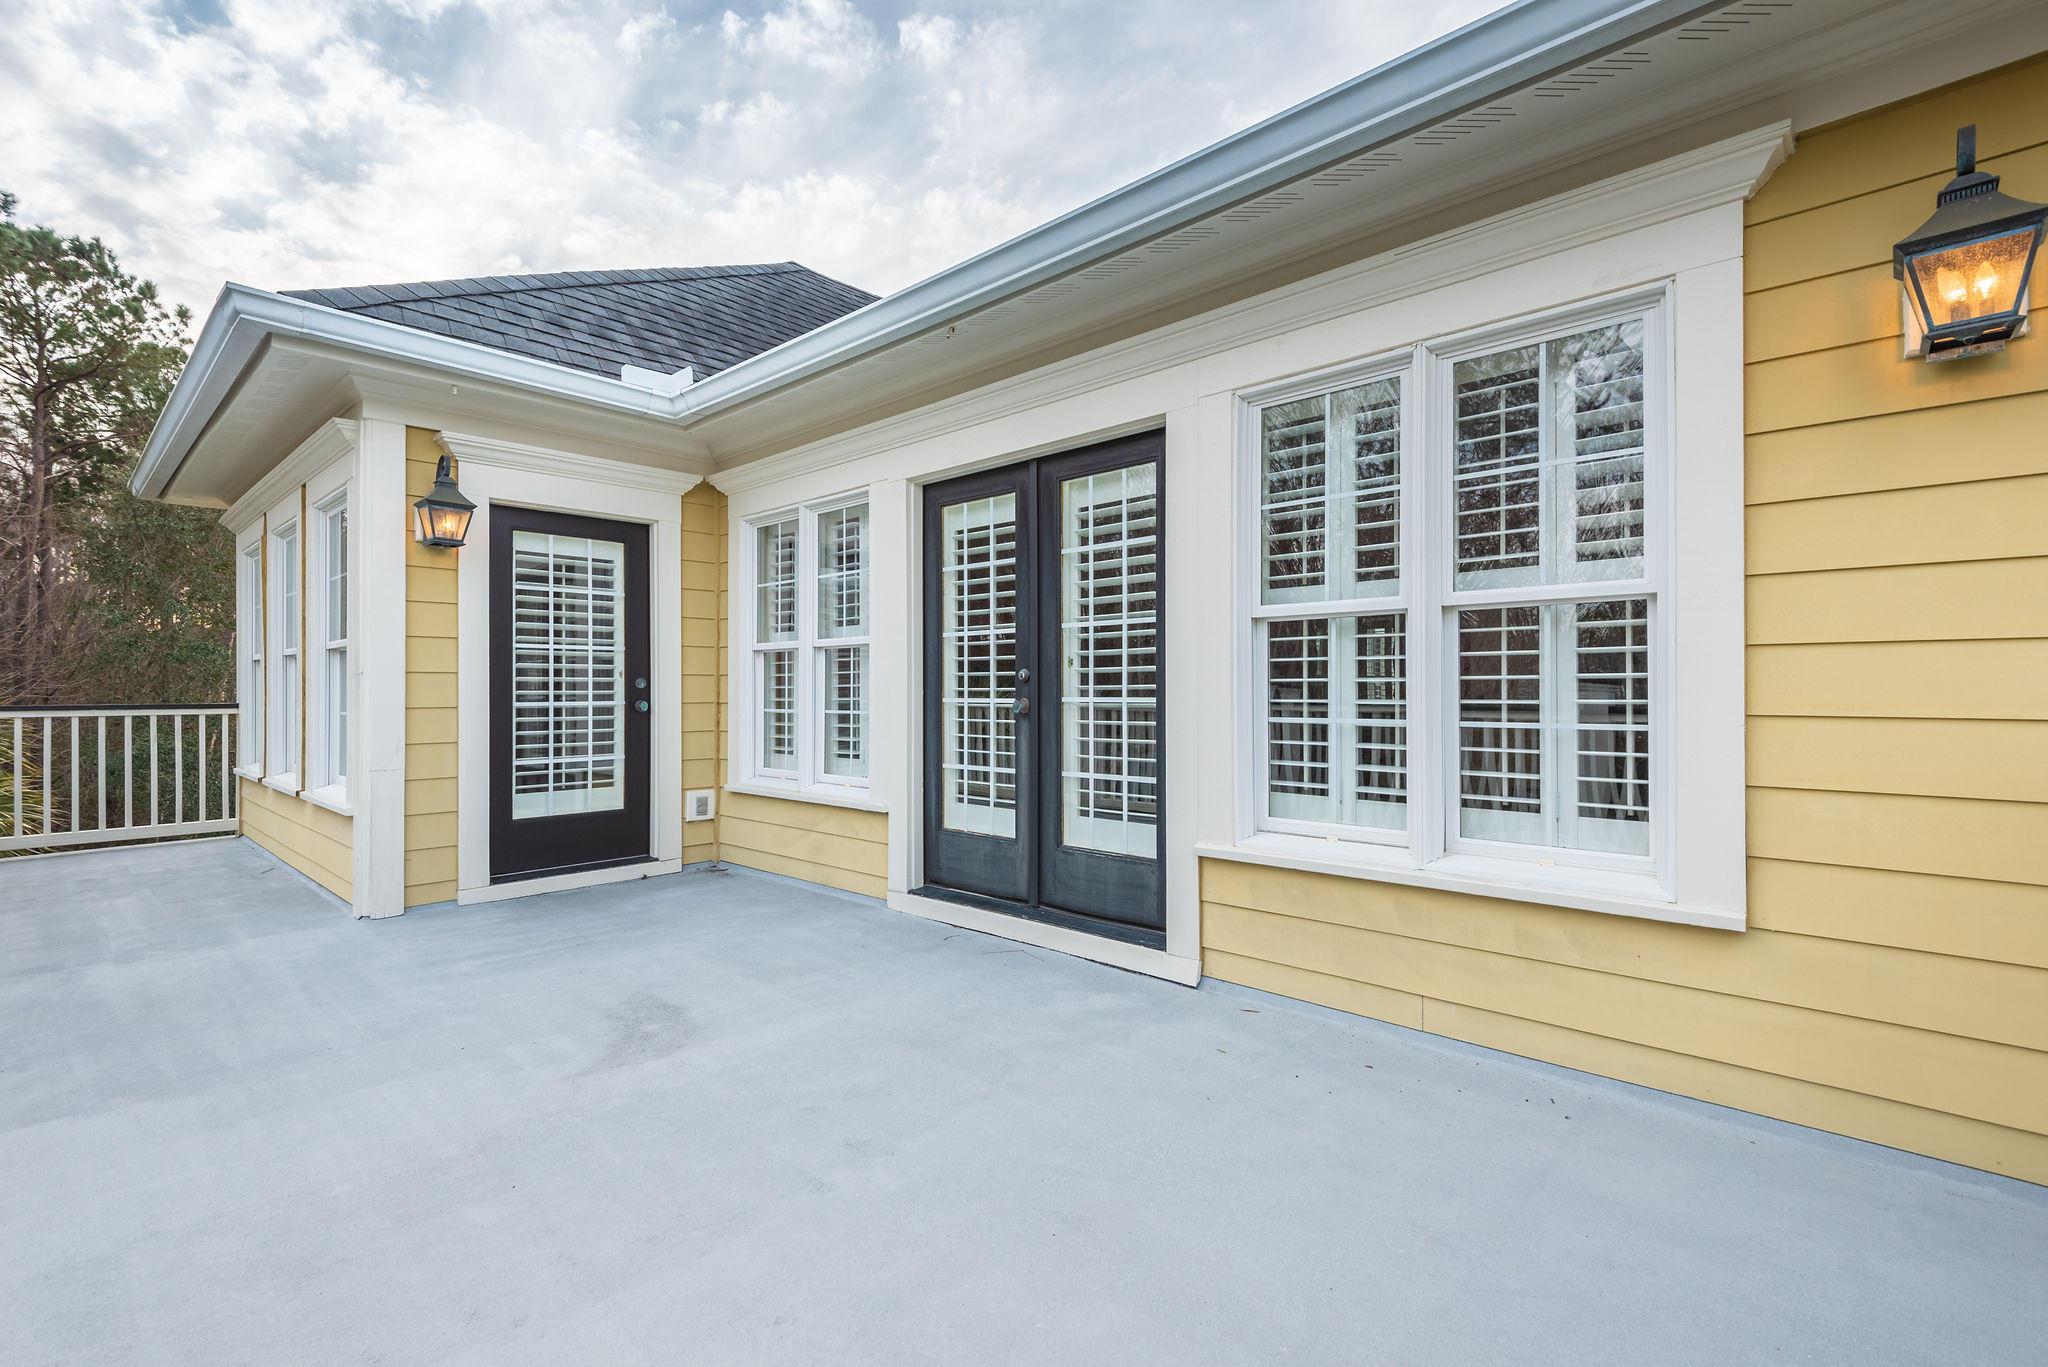 Dunes West Homes For Sale - 1305 King Bird, Mount Pleasant, SC - 15